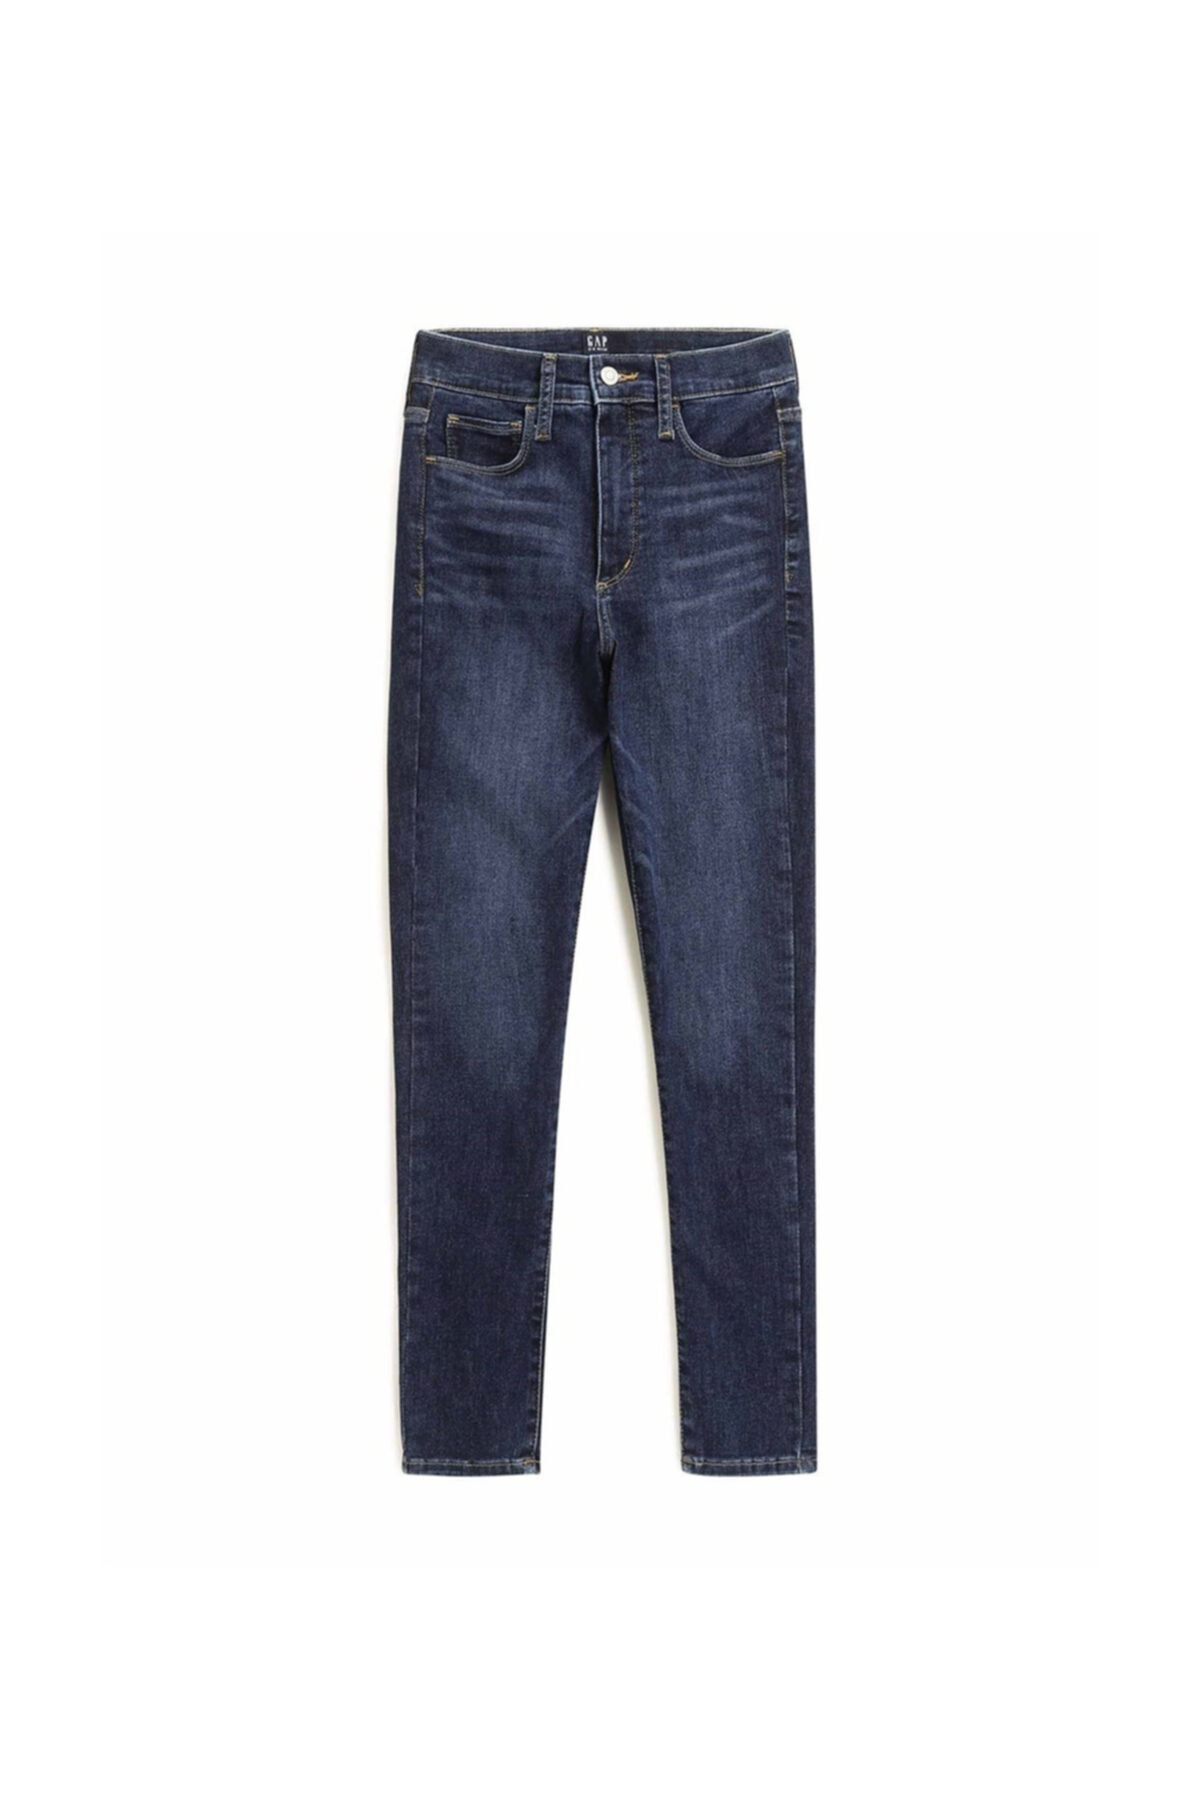 GAP Yüksek Belli Jegging Jean Pantolon 1